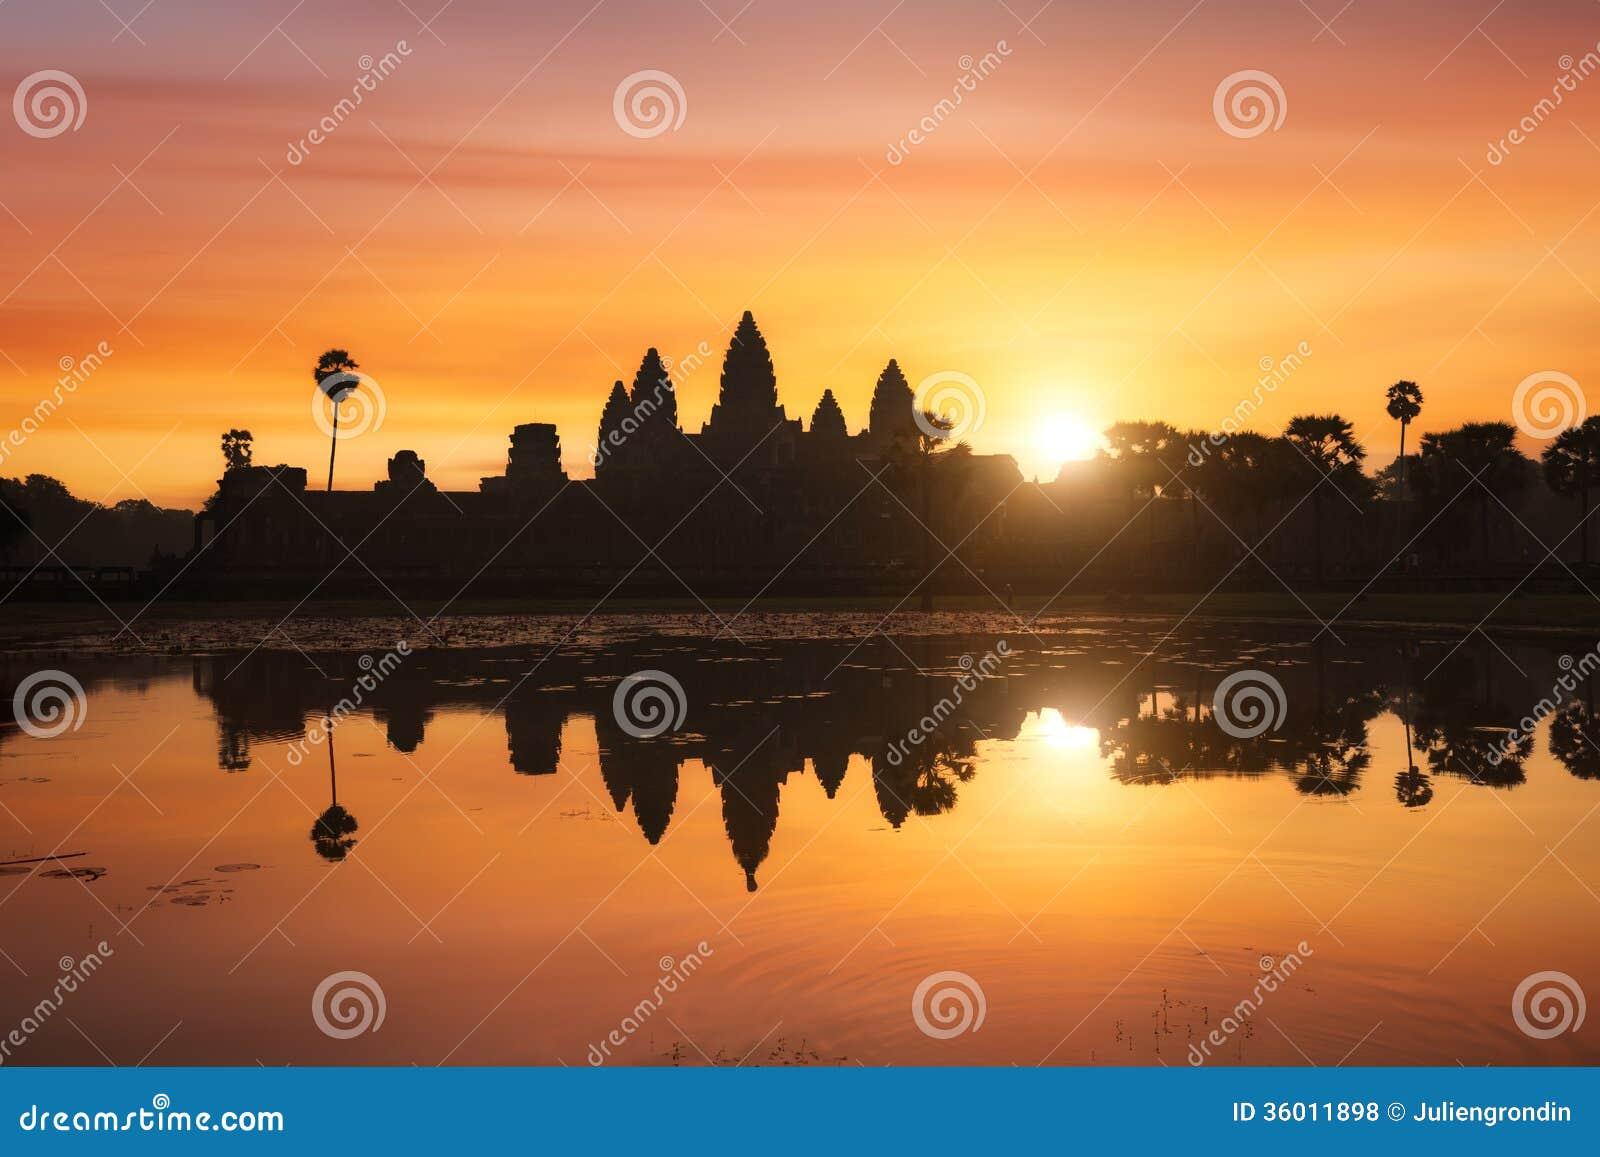 Siem Reap Web Design